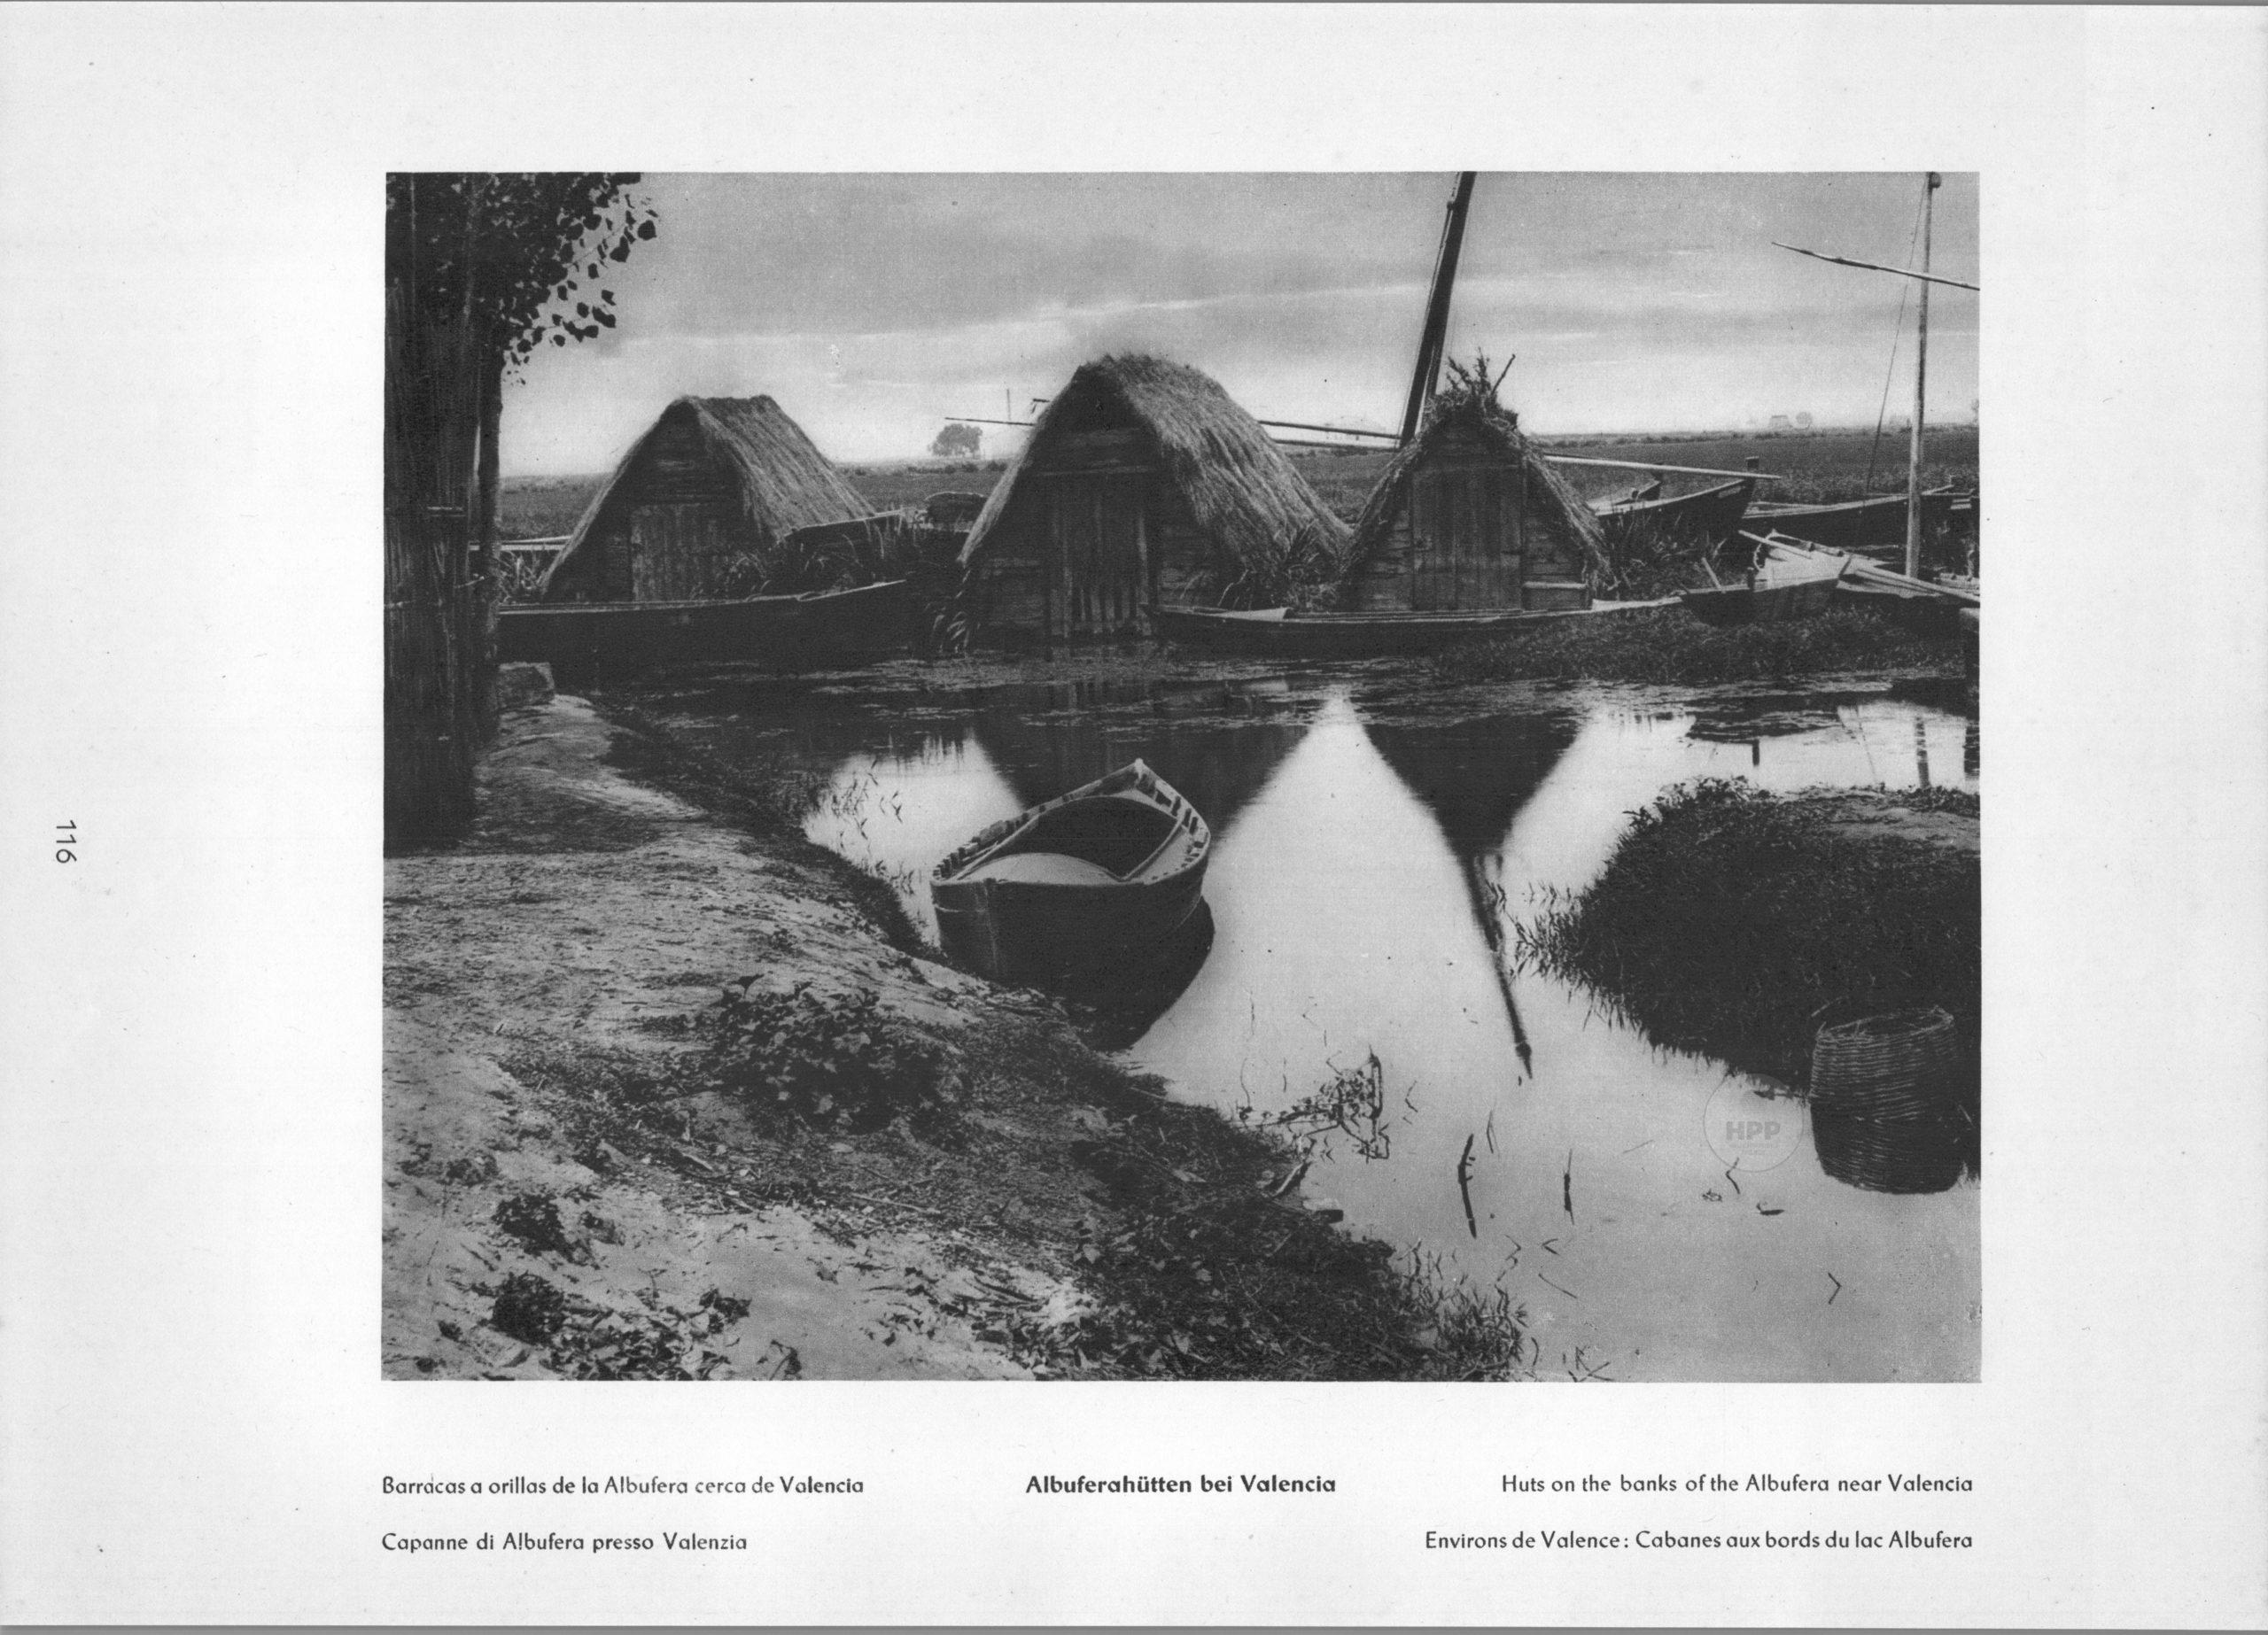 Valencia - Huts on the banks of the Albufera near Valencia